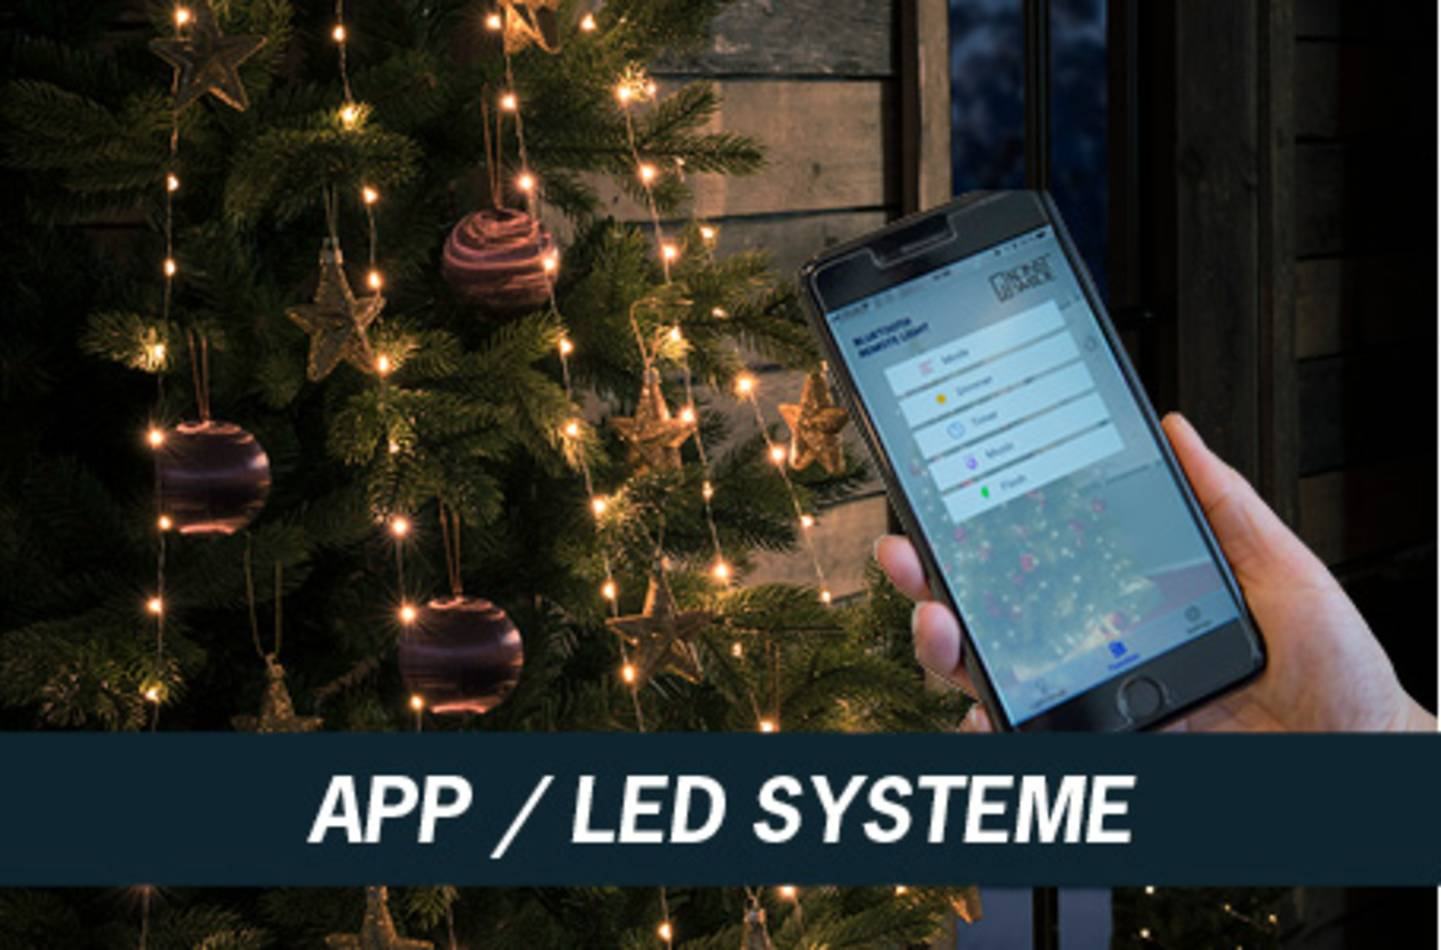 App / LED Systeme